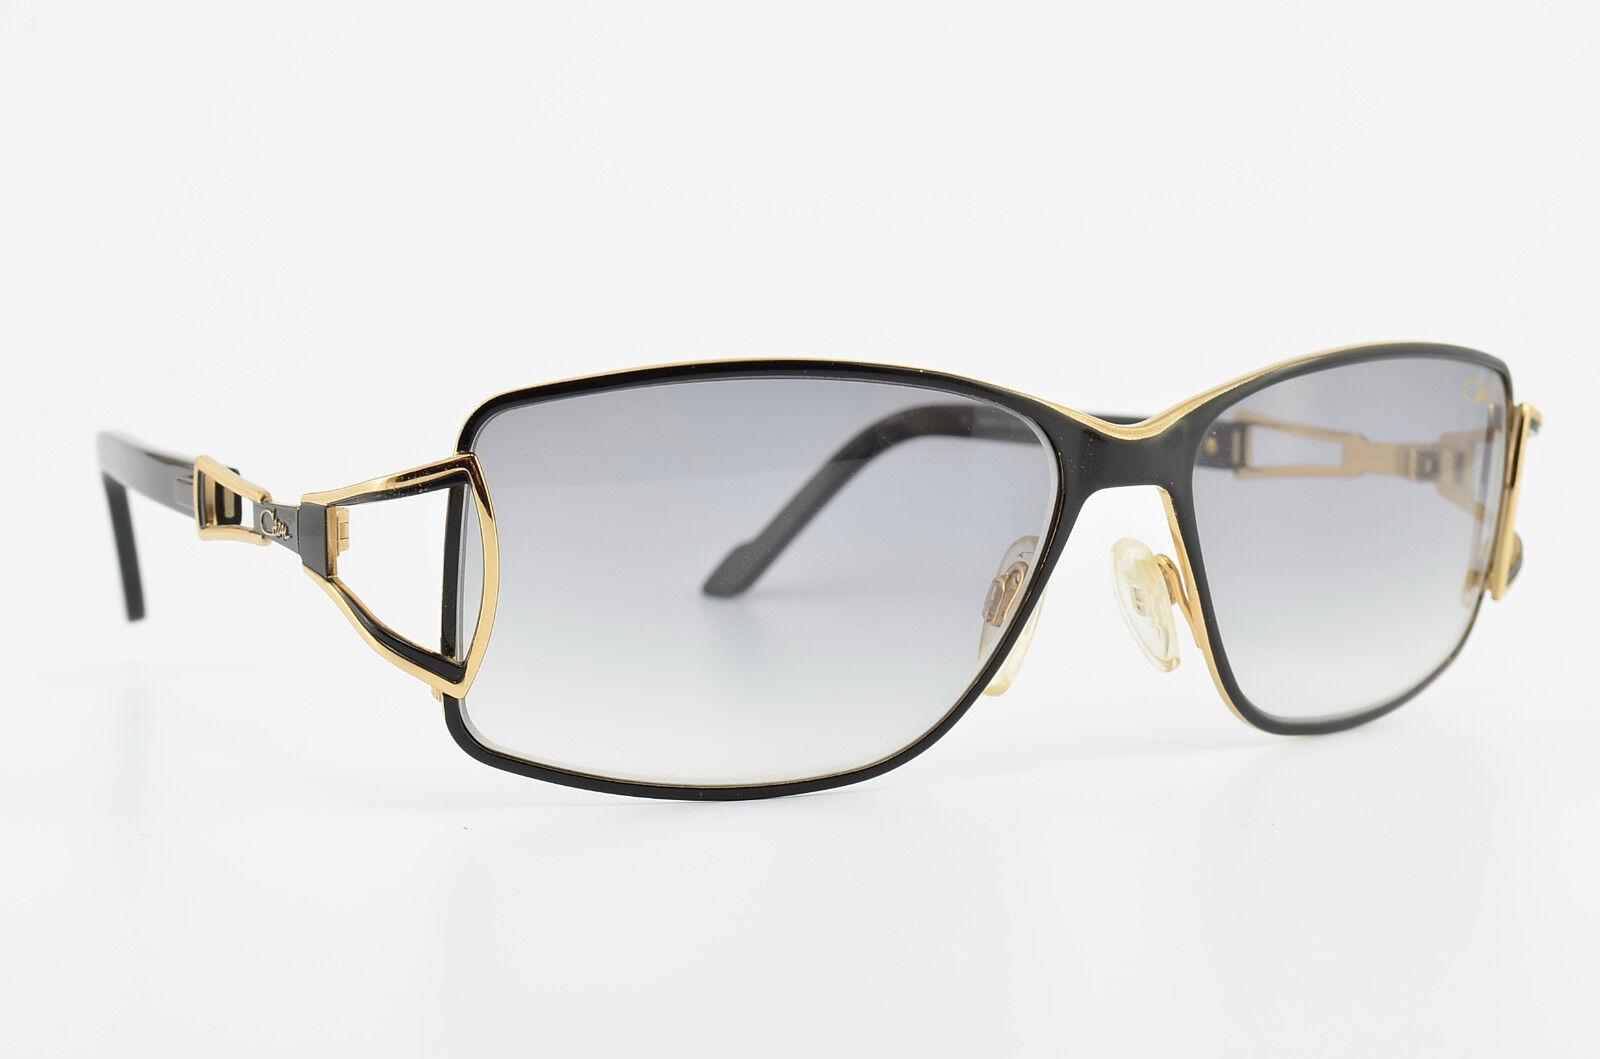 CAZAL Mod. Mod. Mod. 949 Col. 302 Sonnenbrille Luxury Sunglasses Large + Fabergé Case NOS | Genialität  | Günstig  | Elegantes und robustes Menü  529ea4